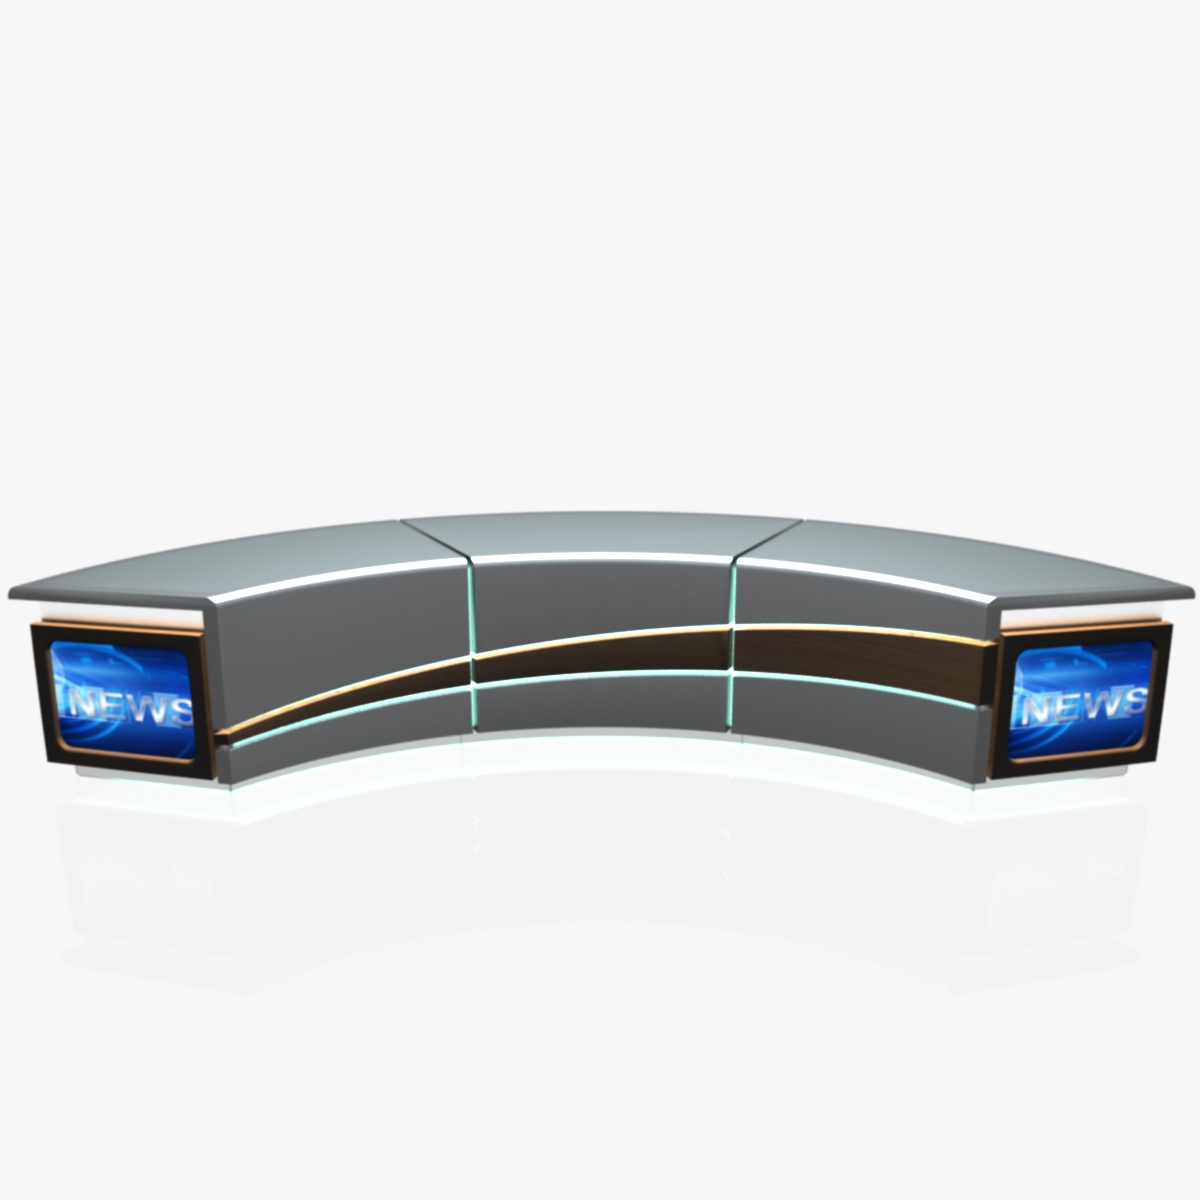 Virtual Tv Studio News Desk 4 3d Model Furniture 3d Models News  # Meuble Tv Nesx